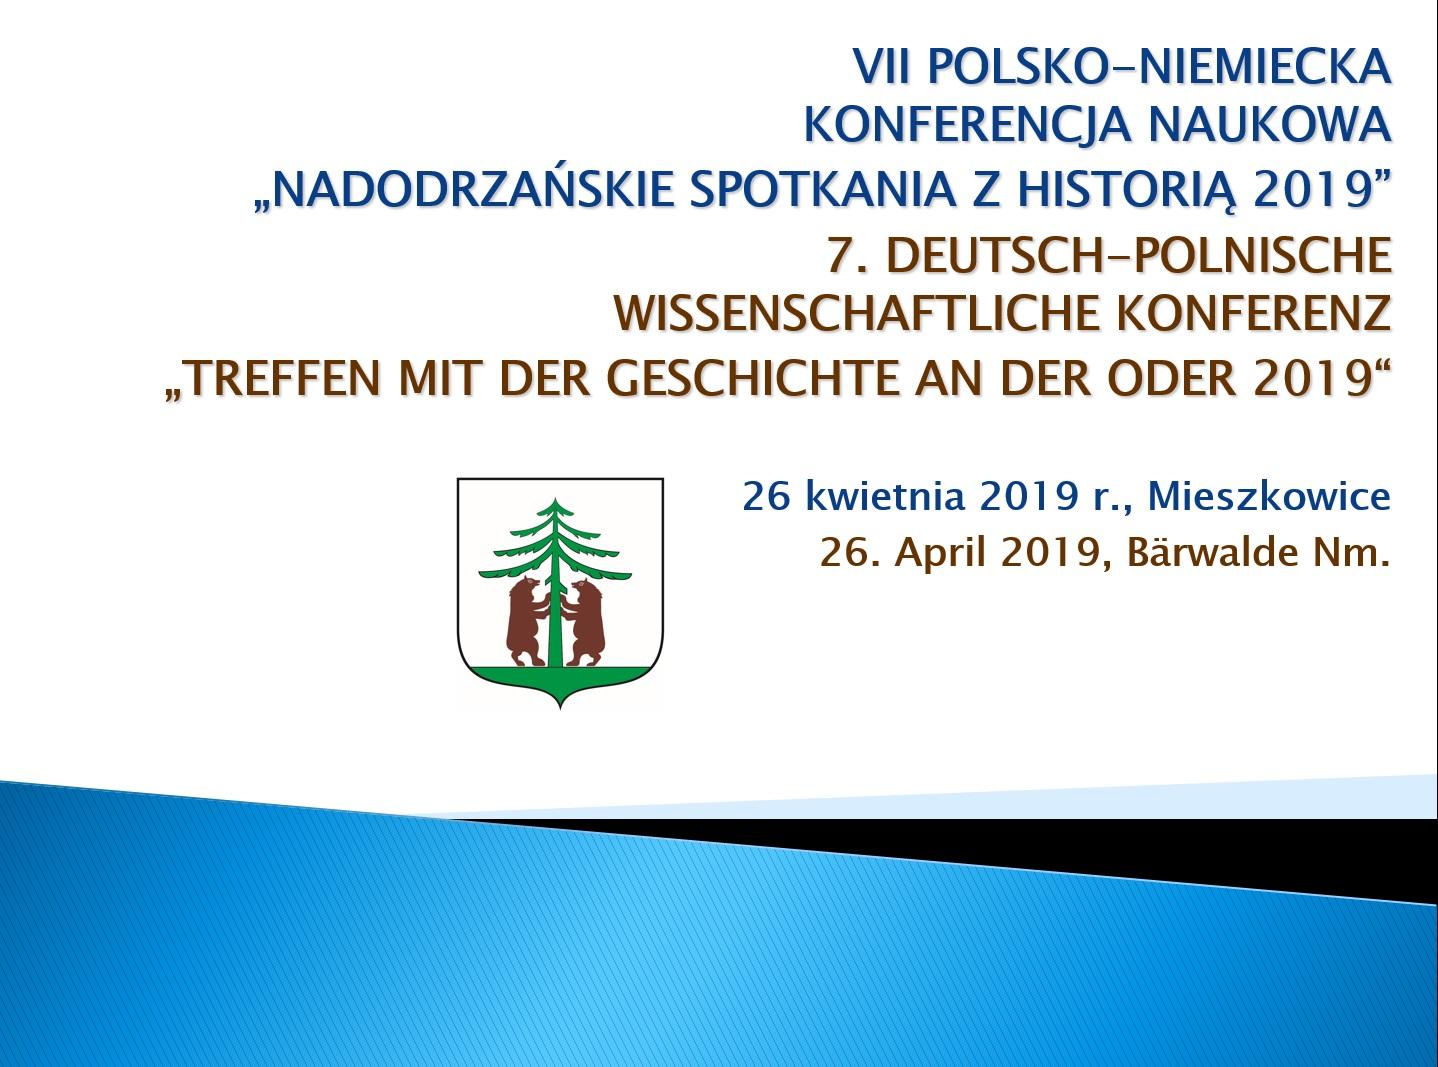 mieszkowice/Knszh2019.jpg